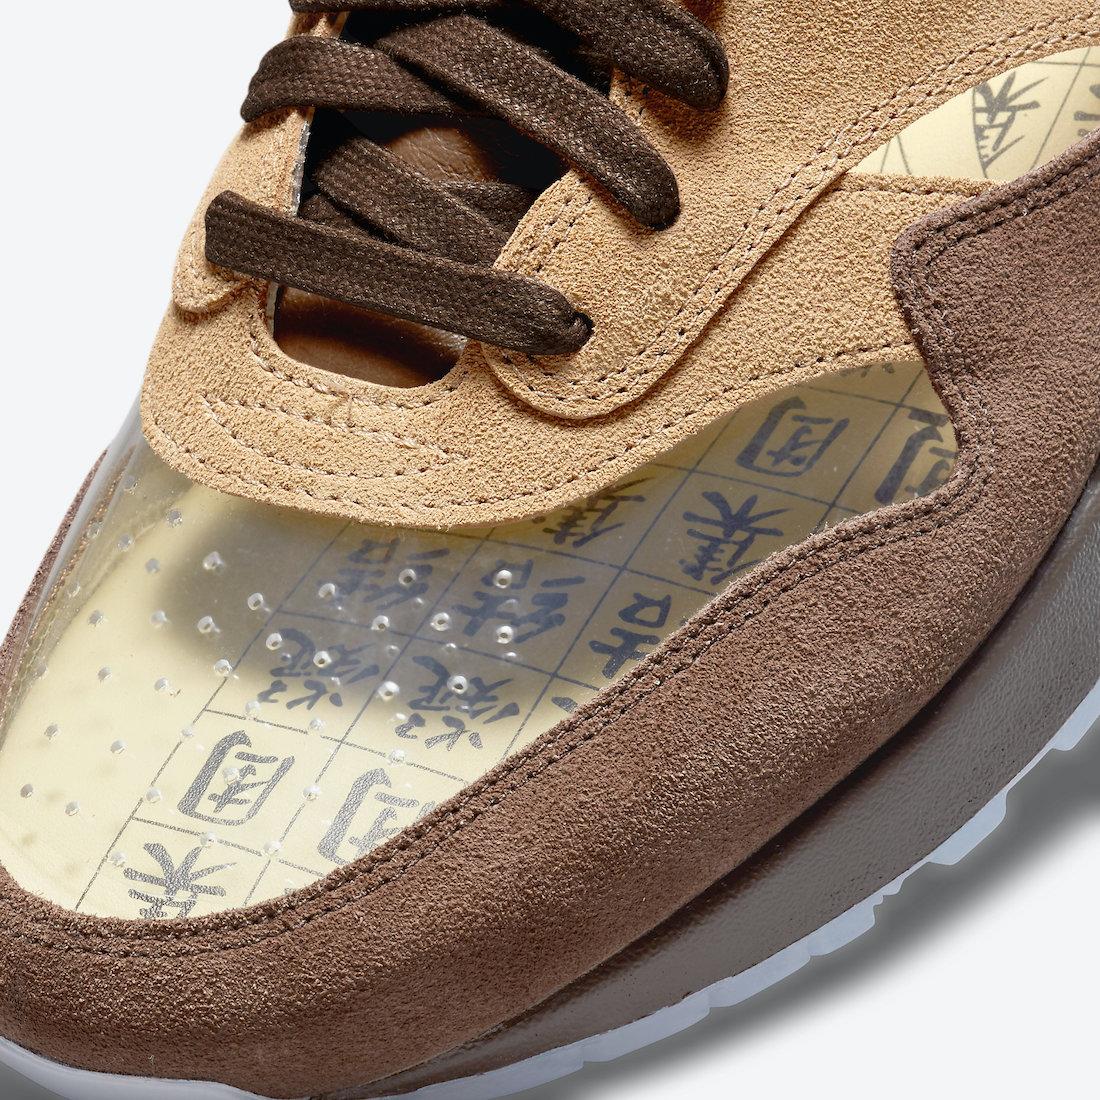 Clot-Nike-Air-Max-1-KOD-CHA-DD1870-200-Release-Date-6